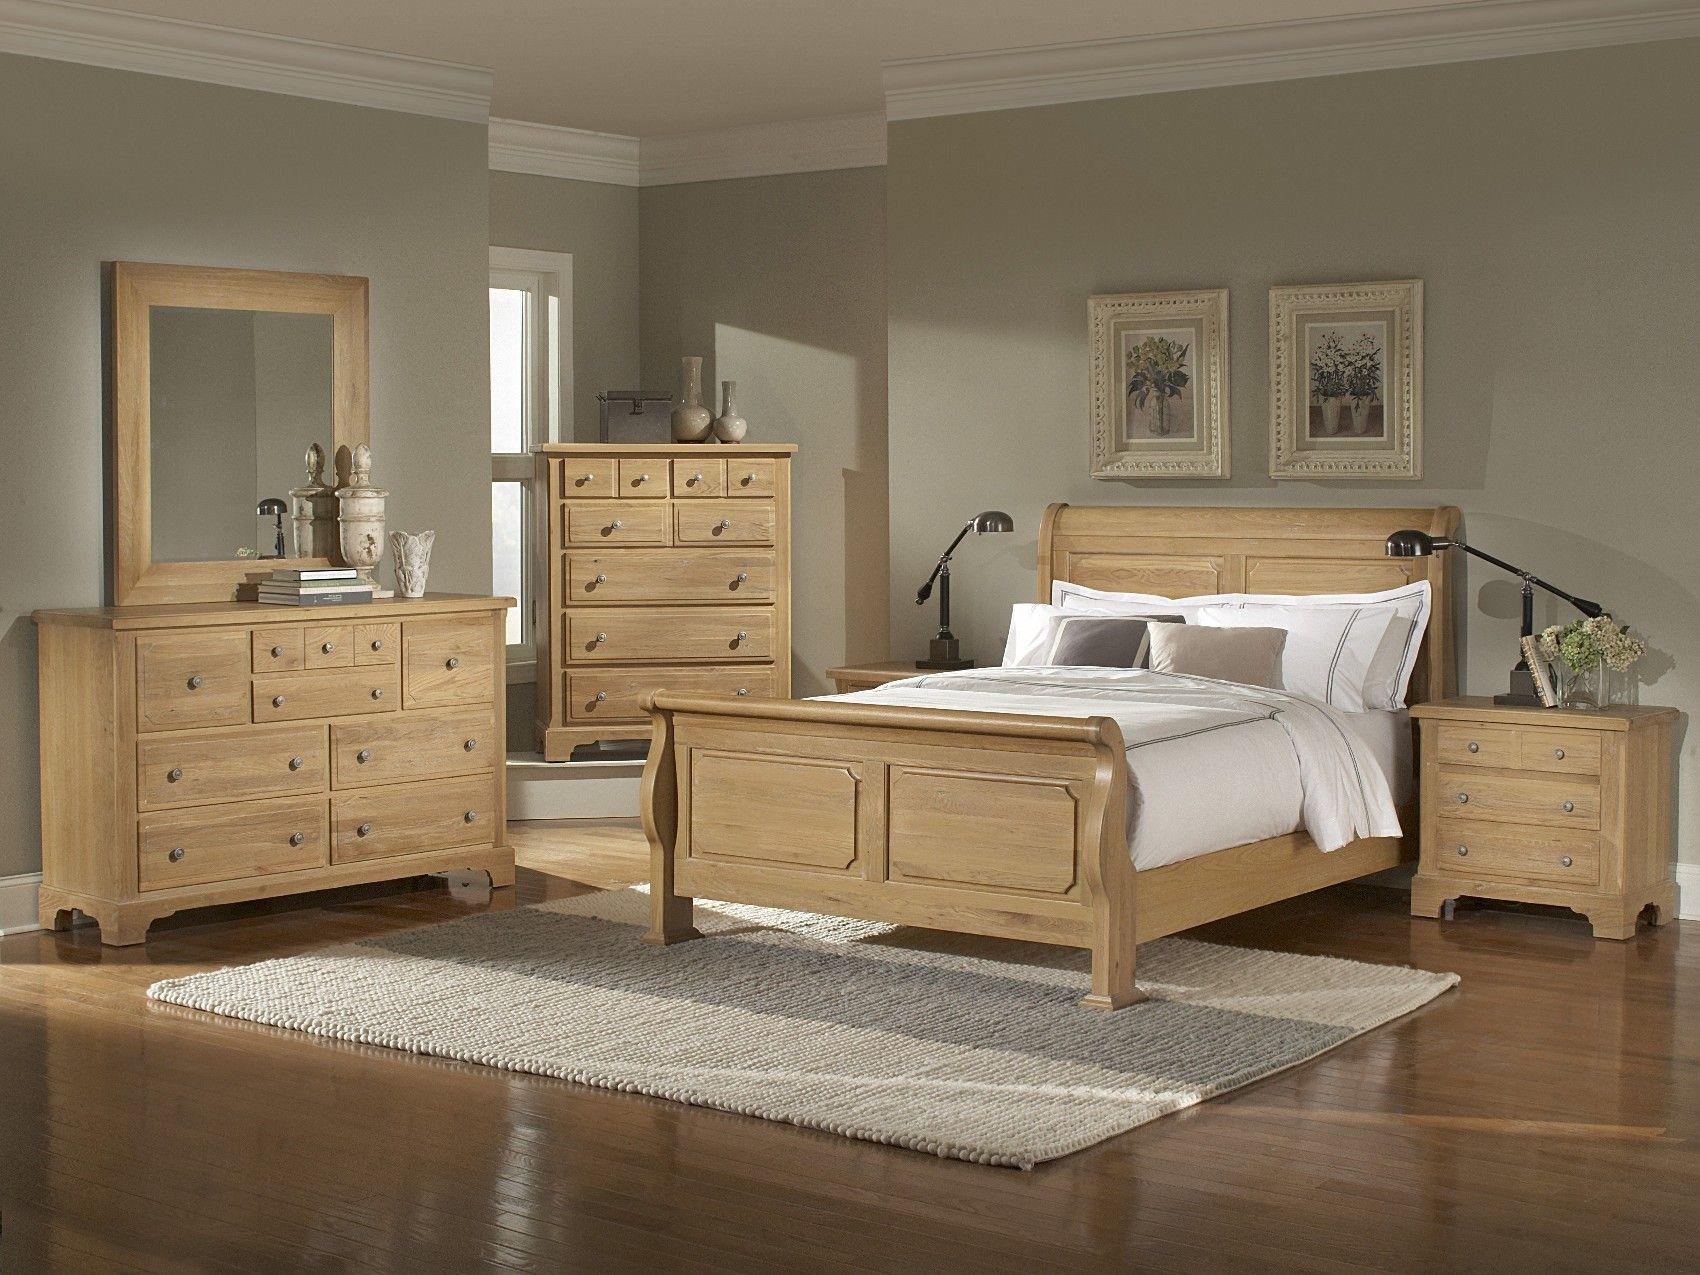 Oak bedroom furniture sets washed oak queen sleigh bedroom group a at